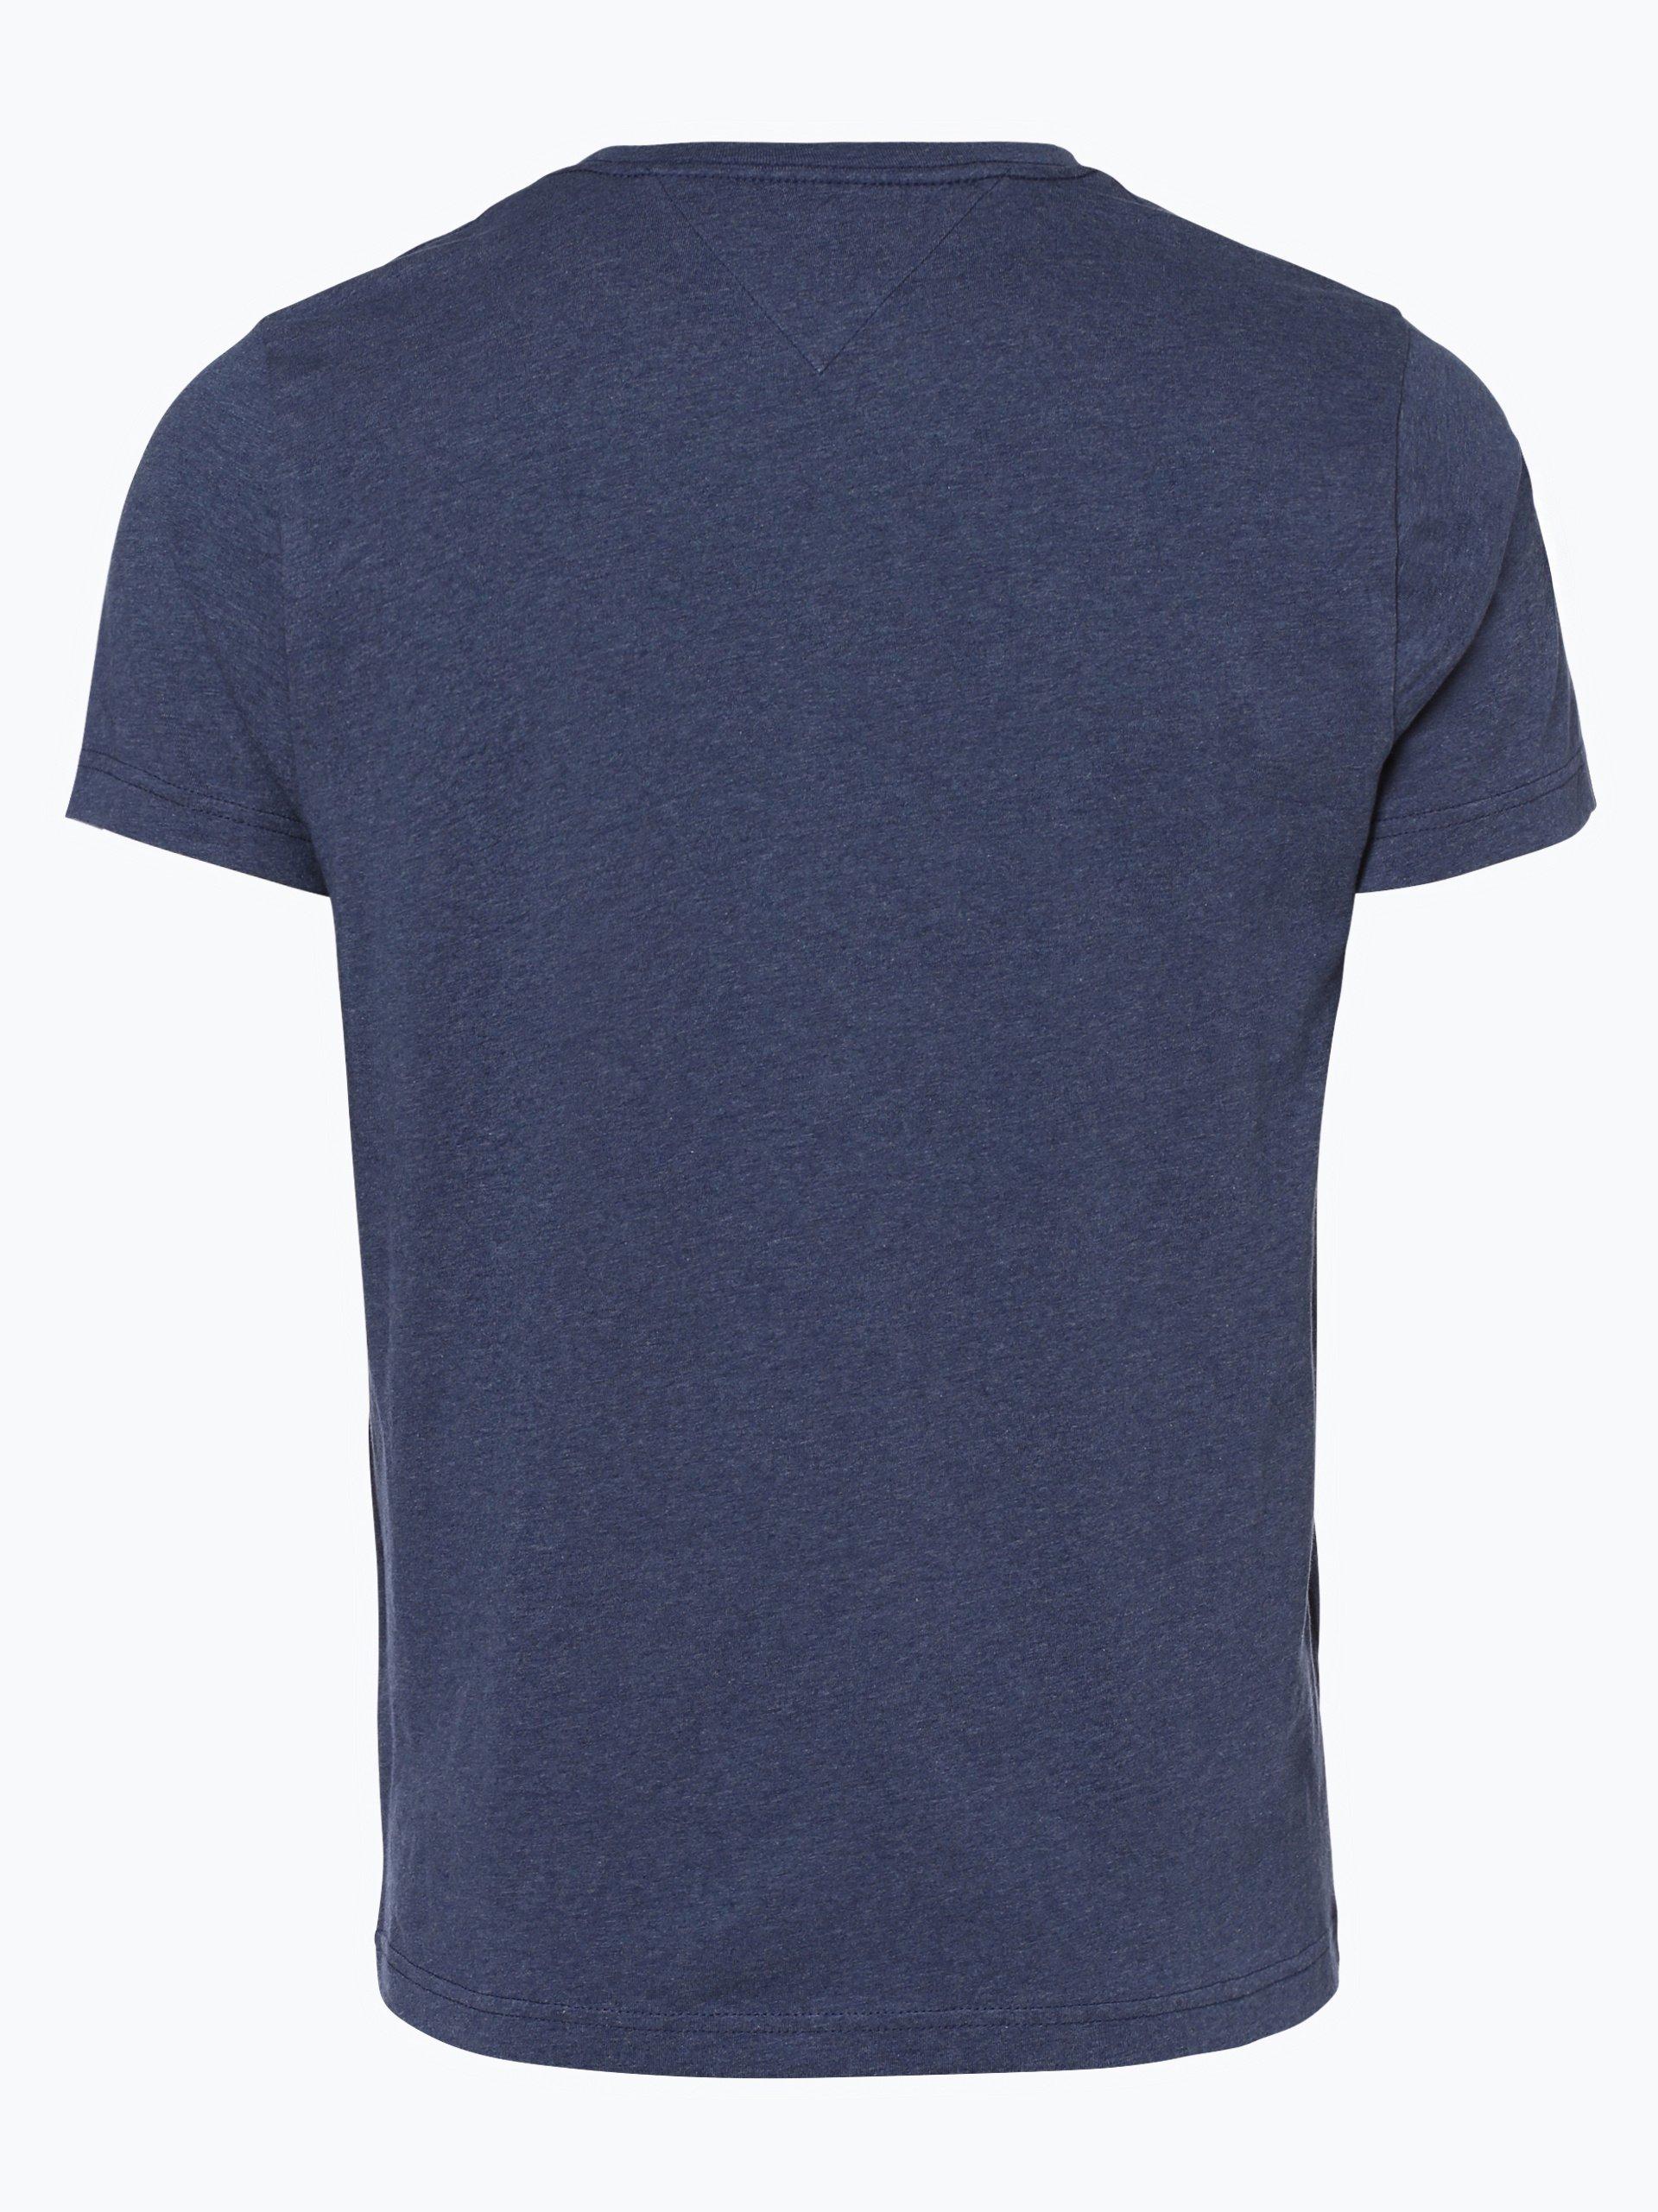 tommy hilfiger herren t shirt owen indigo bedruckt online kaufen vangraaf com. Black Bedroom Furniture Sets. Home Design Ideas